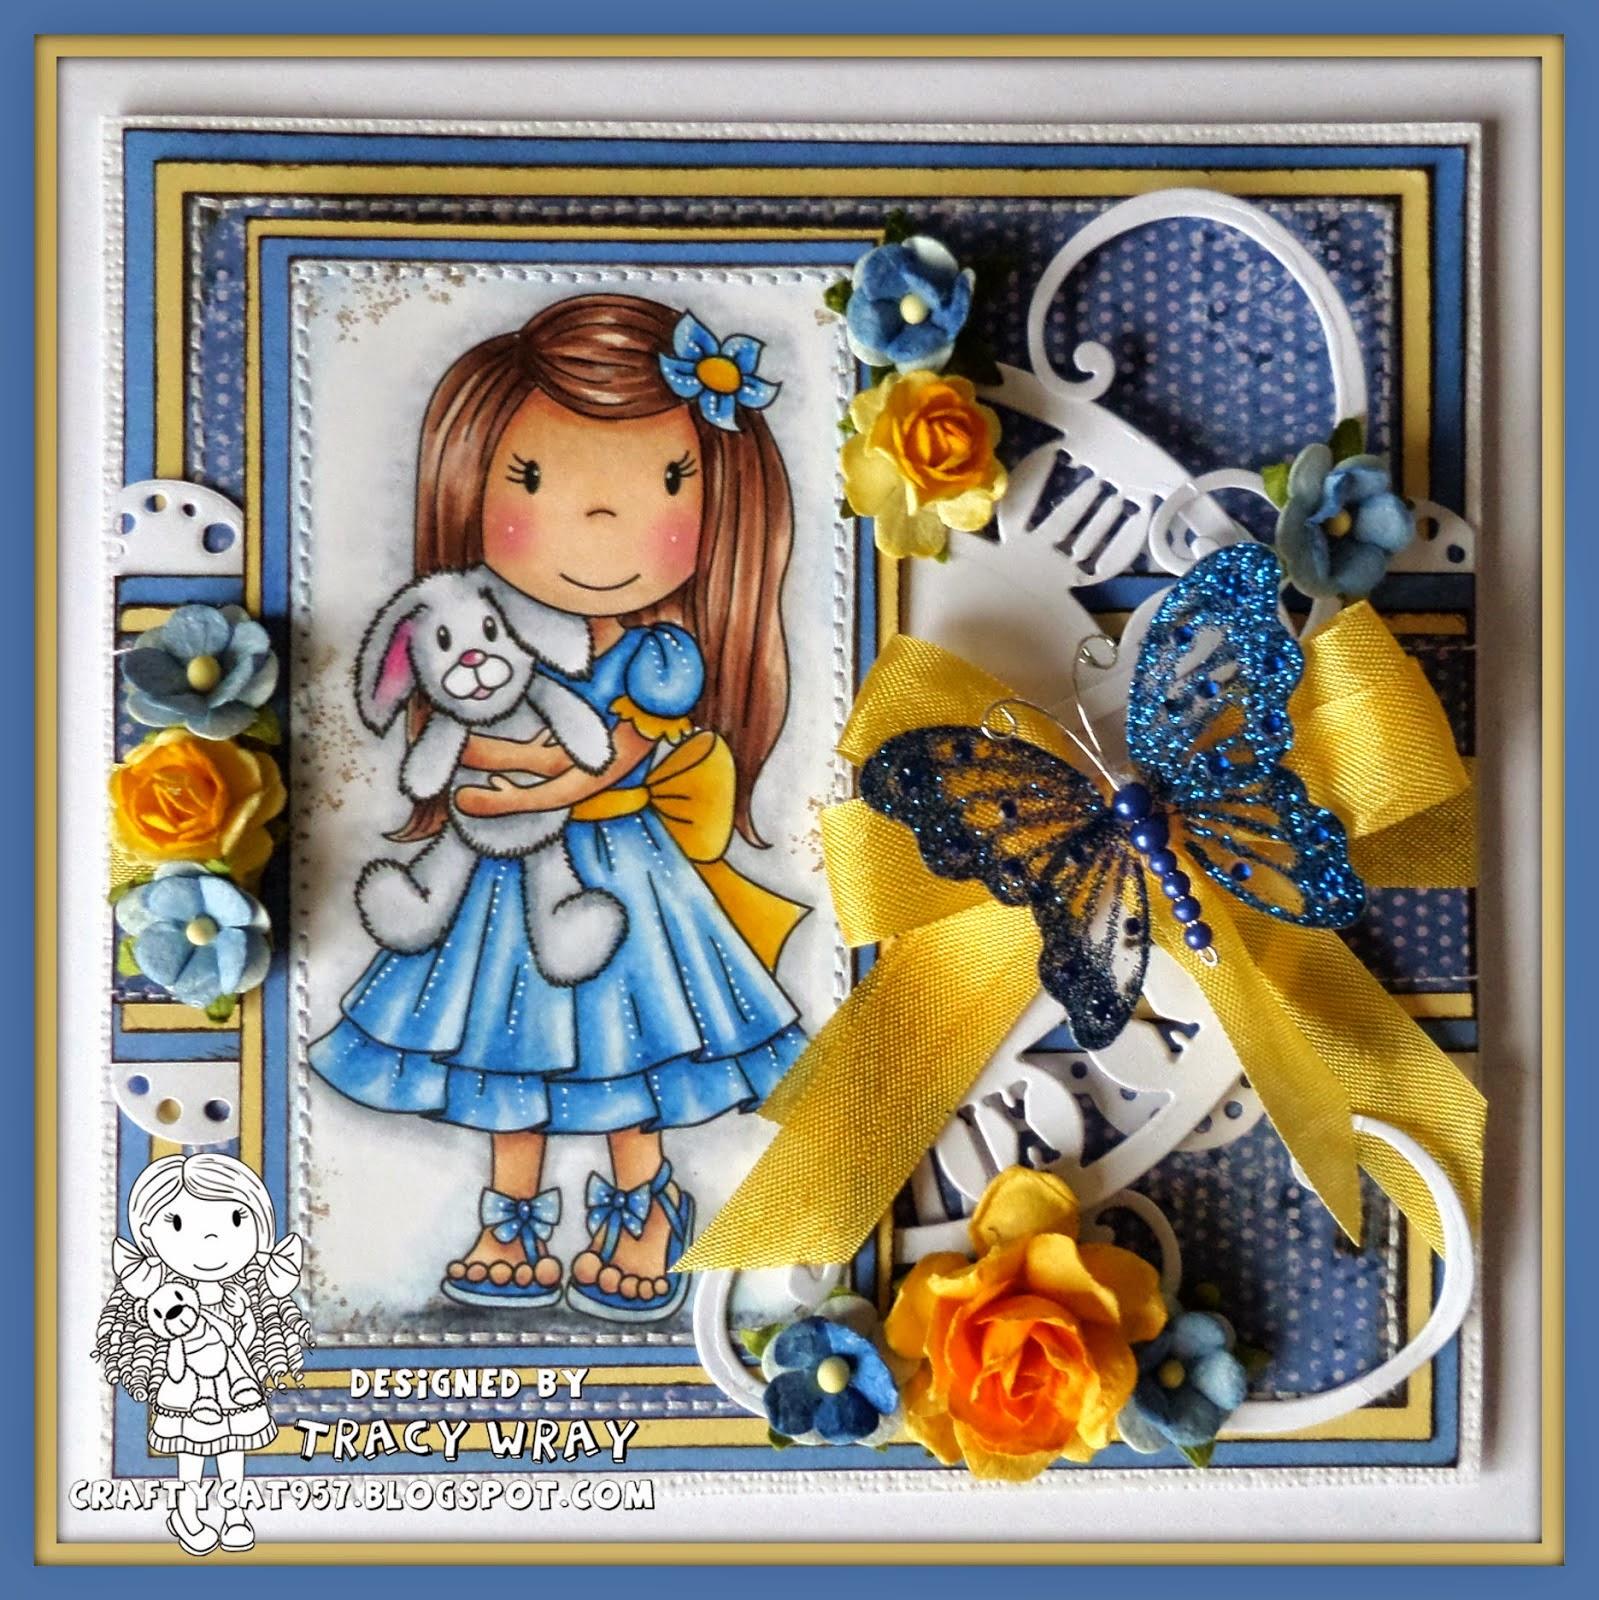 http://3.bp.blogspot.com/-mUmwKrTA8AI/VOyL67tFOBI/AAAAAAAACgs/W6kw6ENh8NA/s1600/somebunnylovesyouTracy.jpg